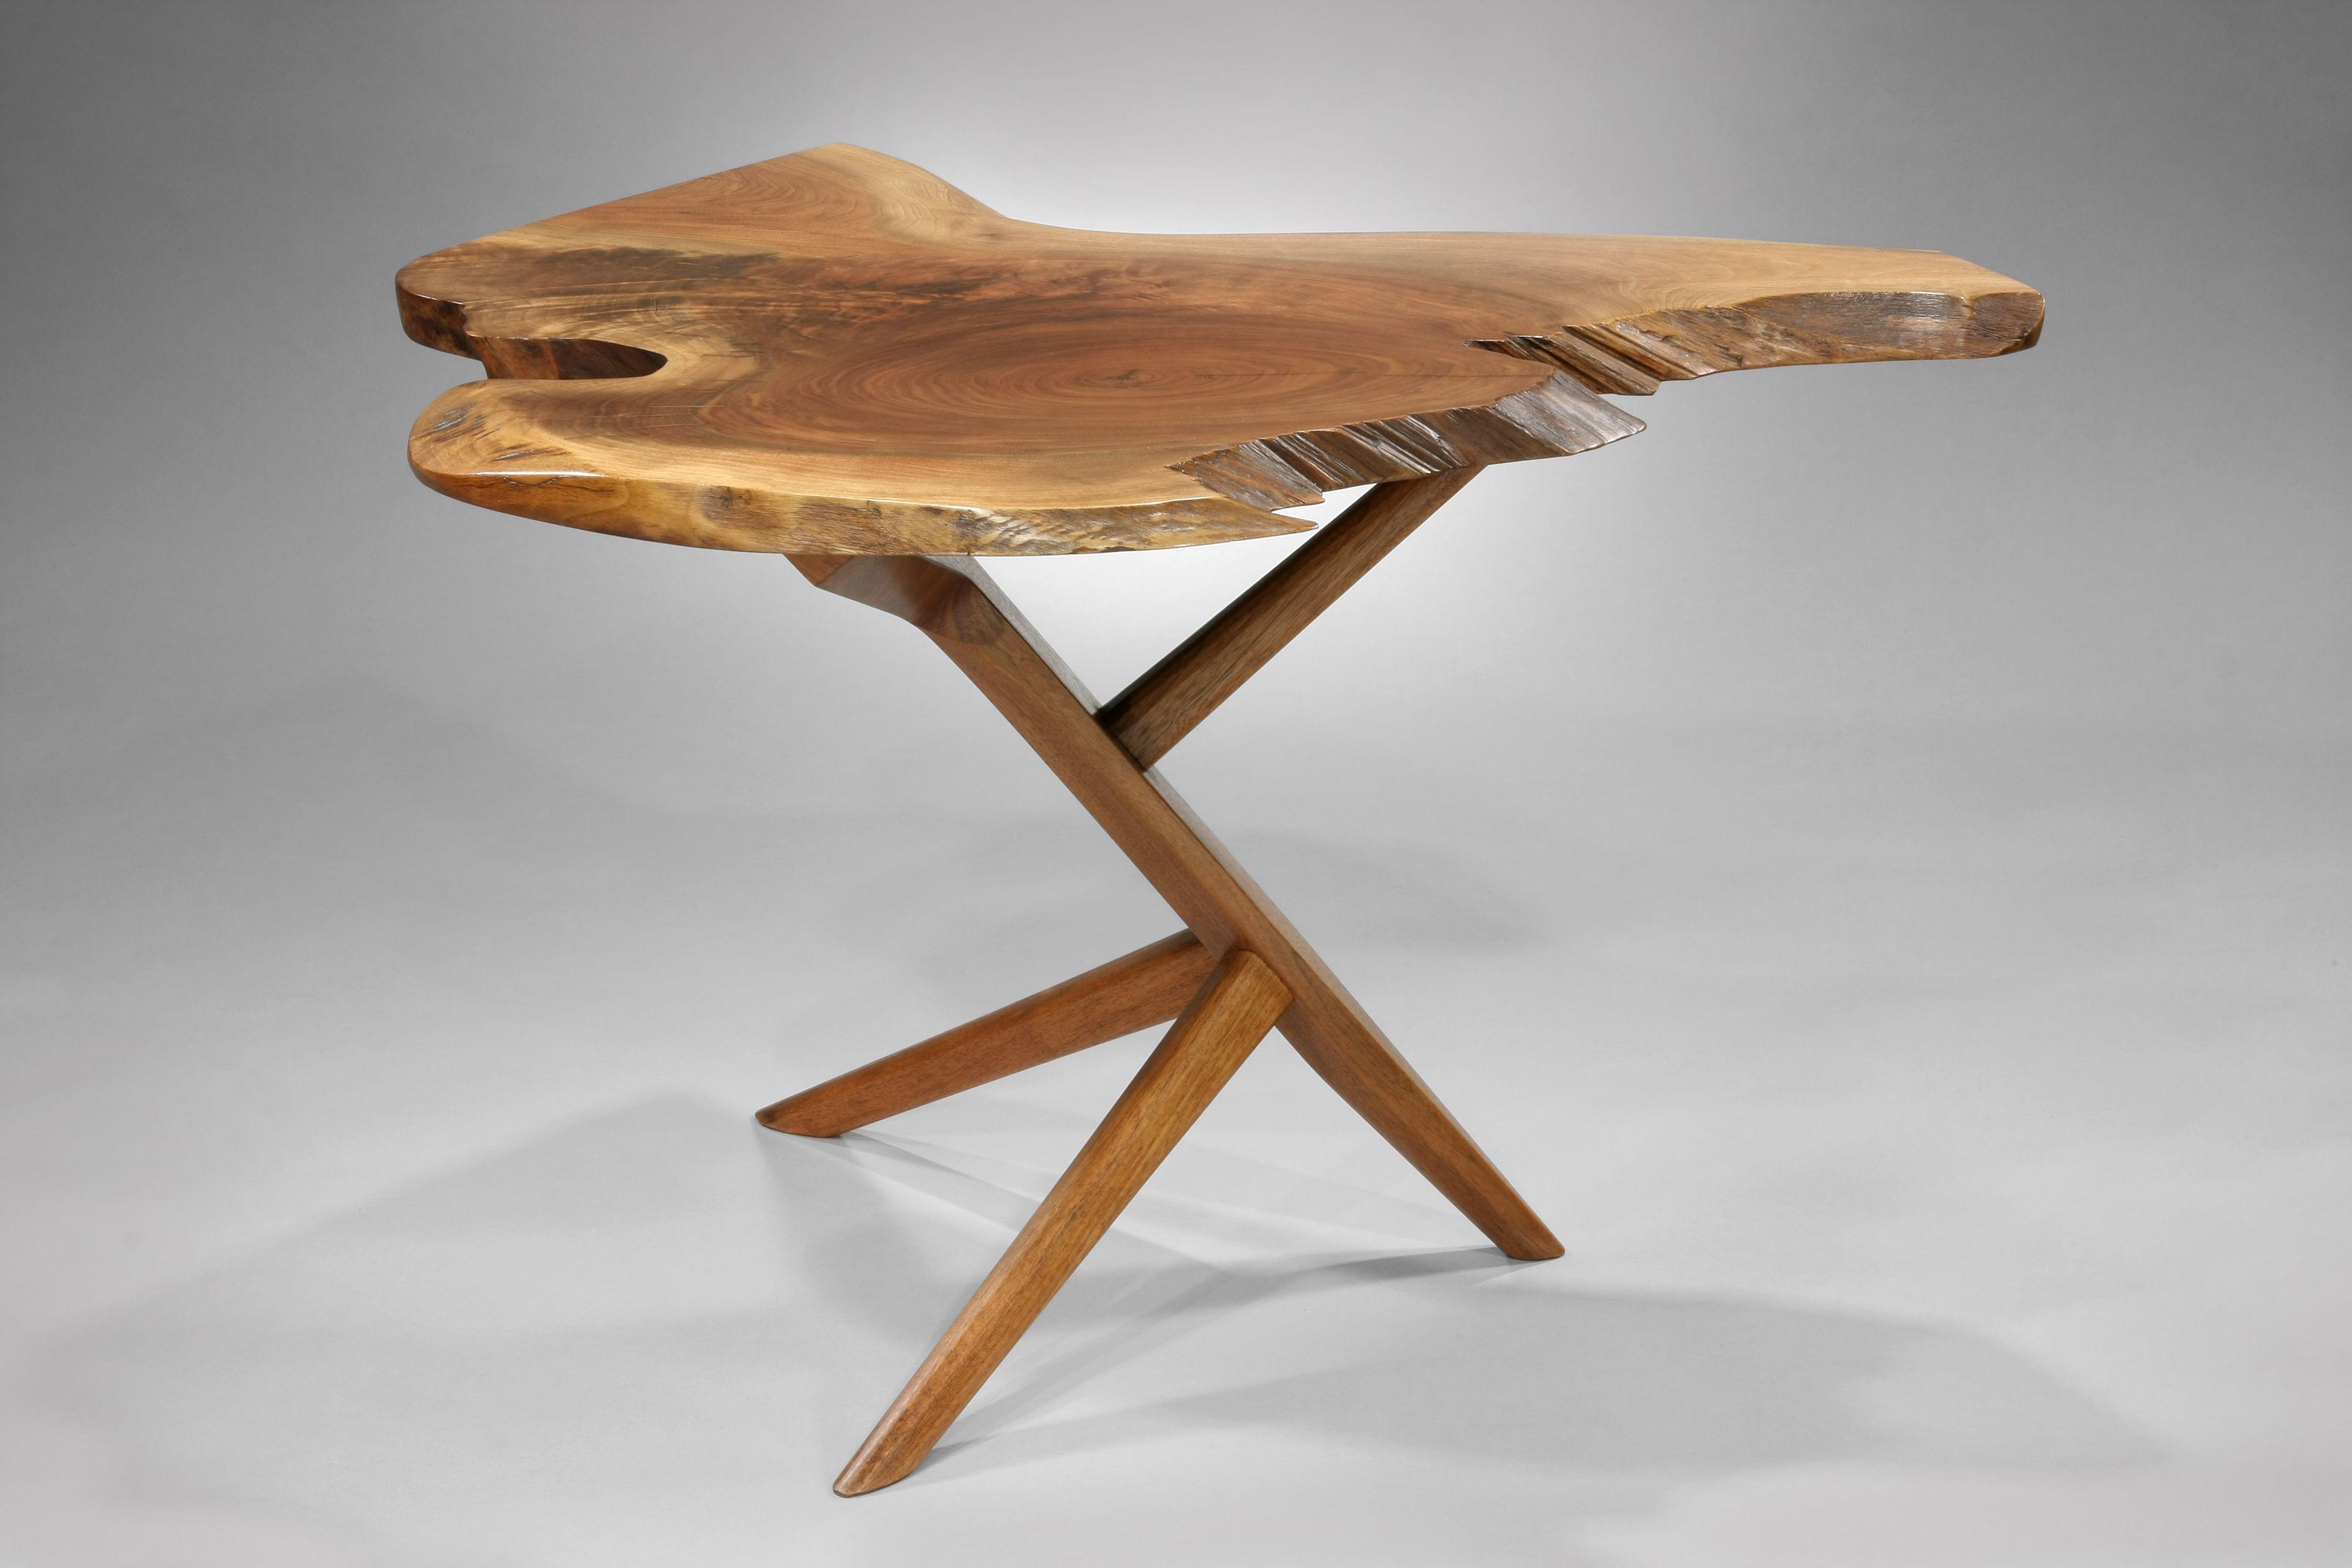 George Nakashima innovator of 20th century furniture design and a